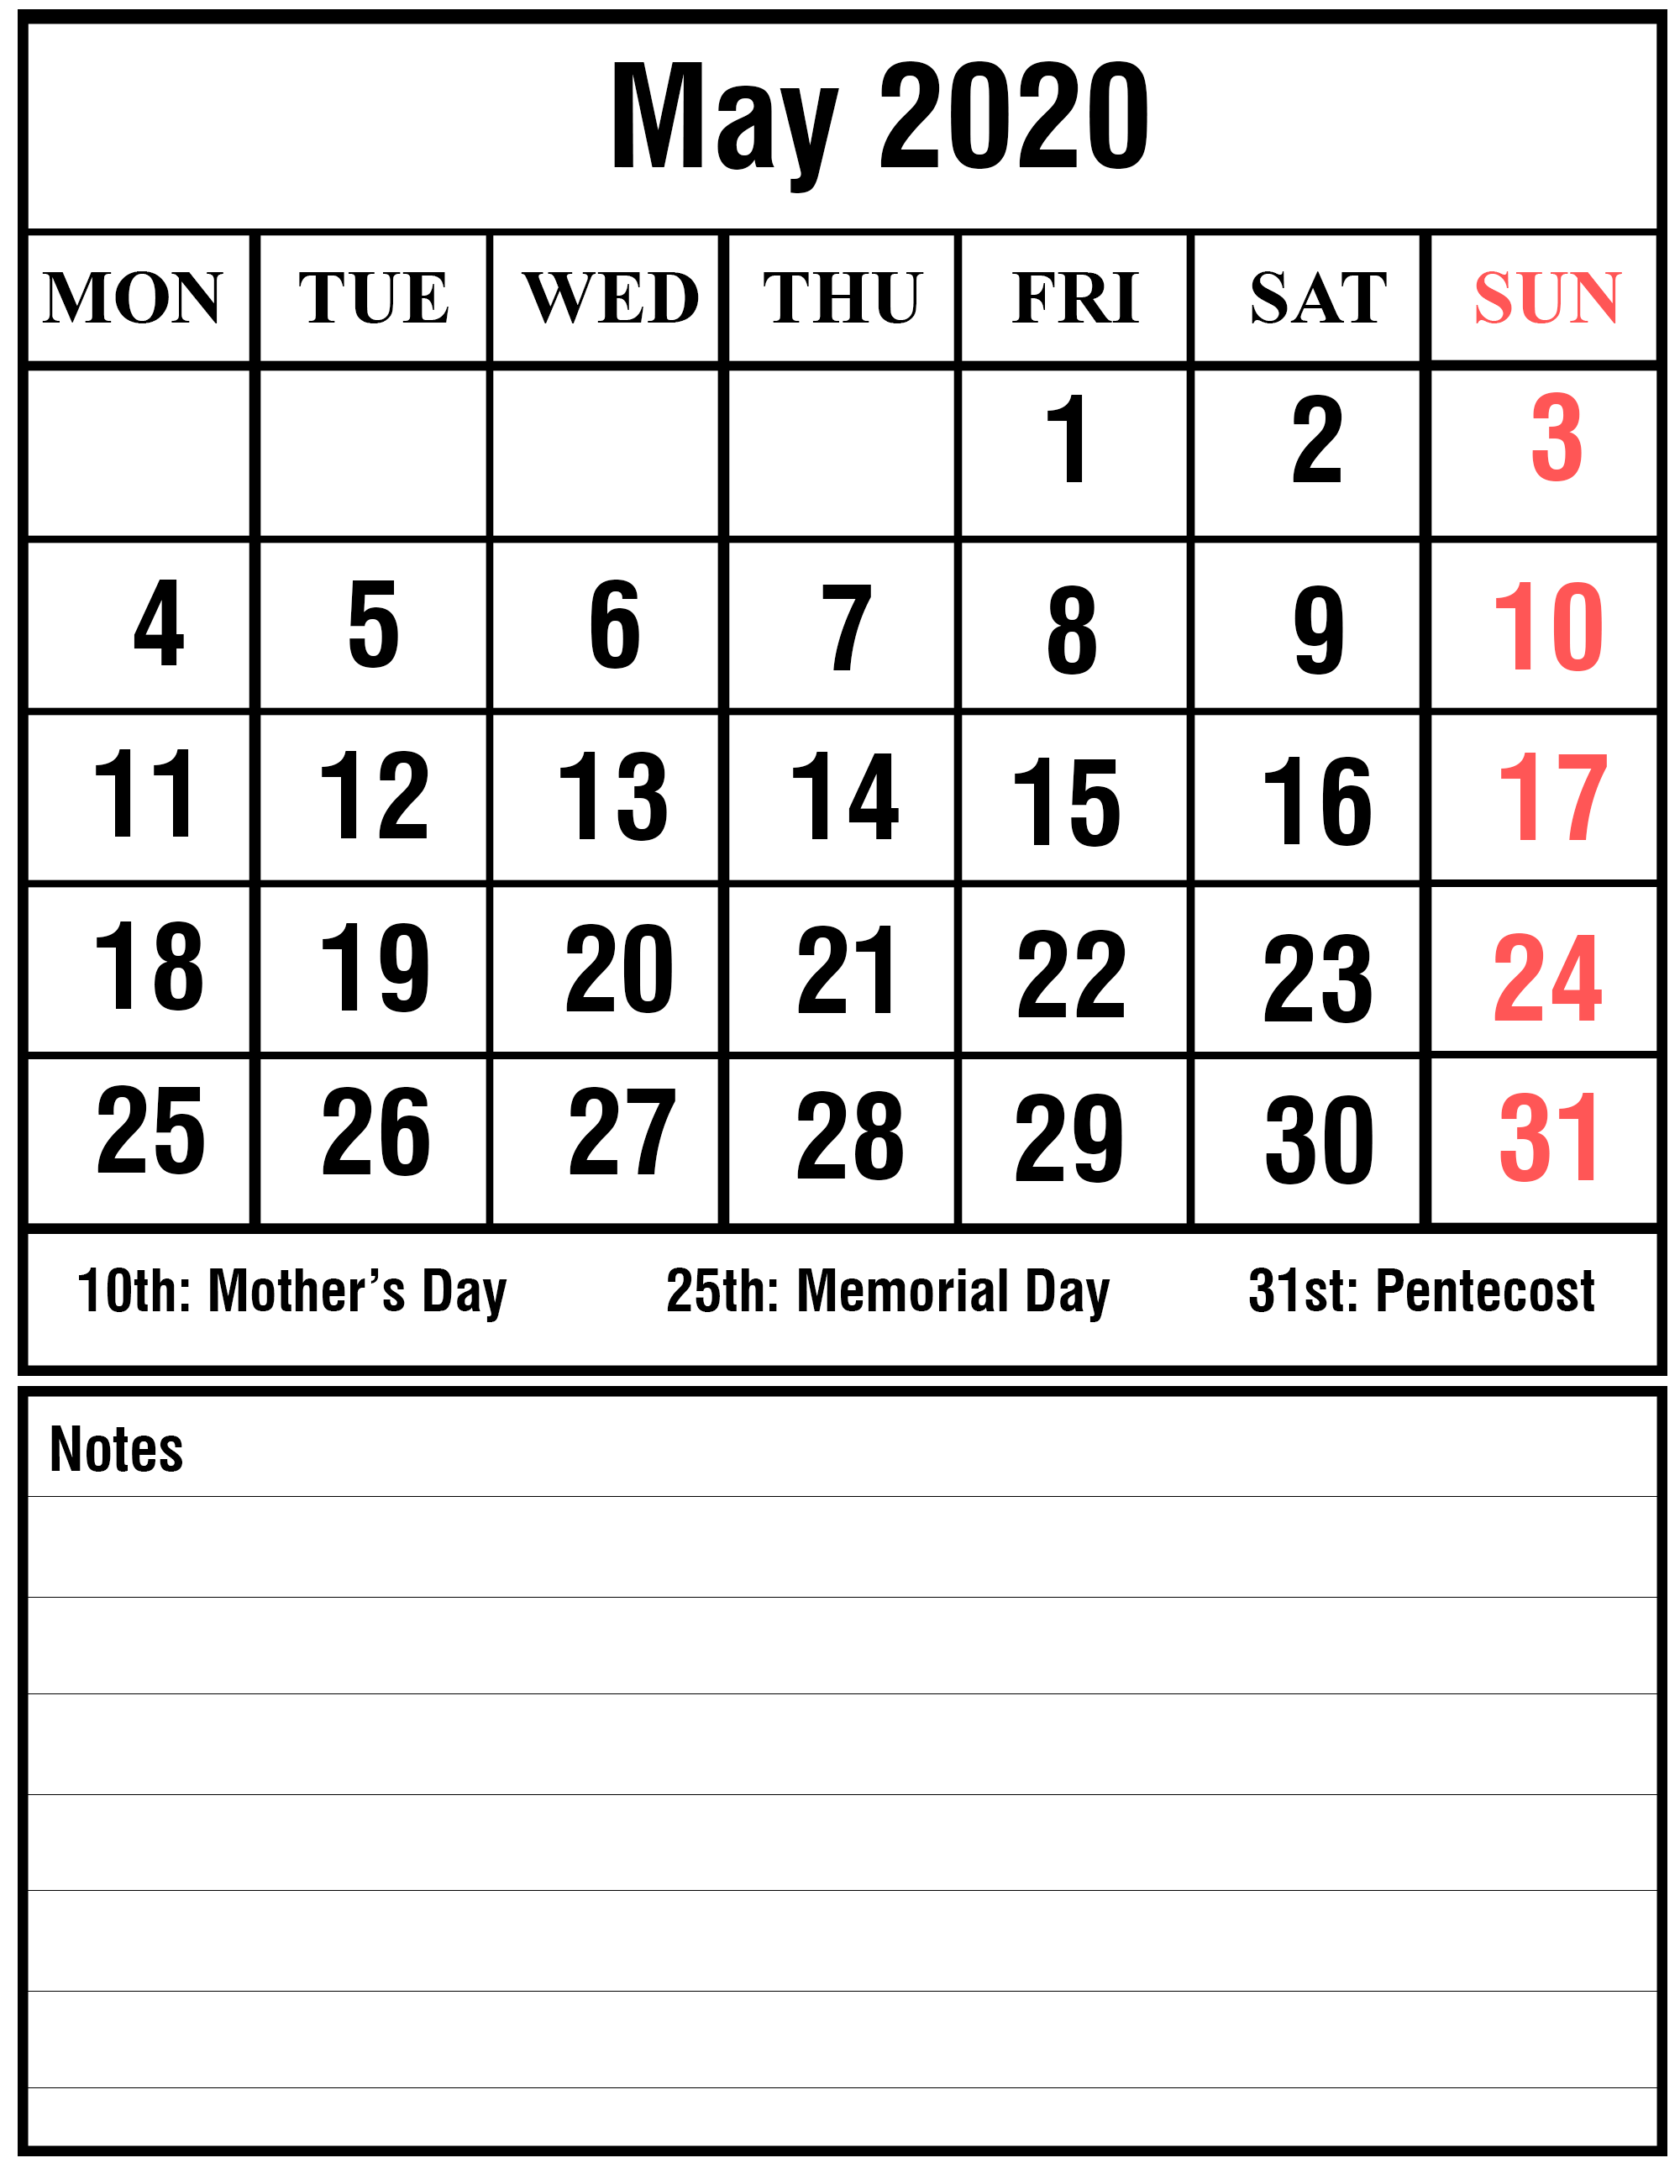 May 2020 Wall Calendar